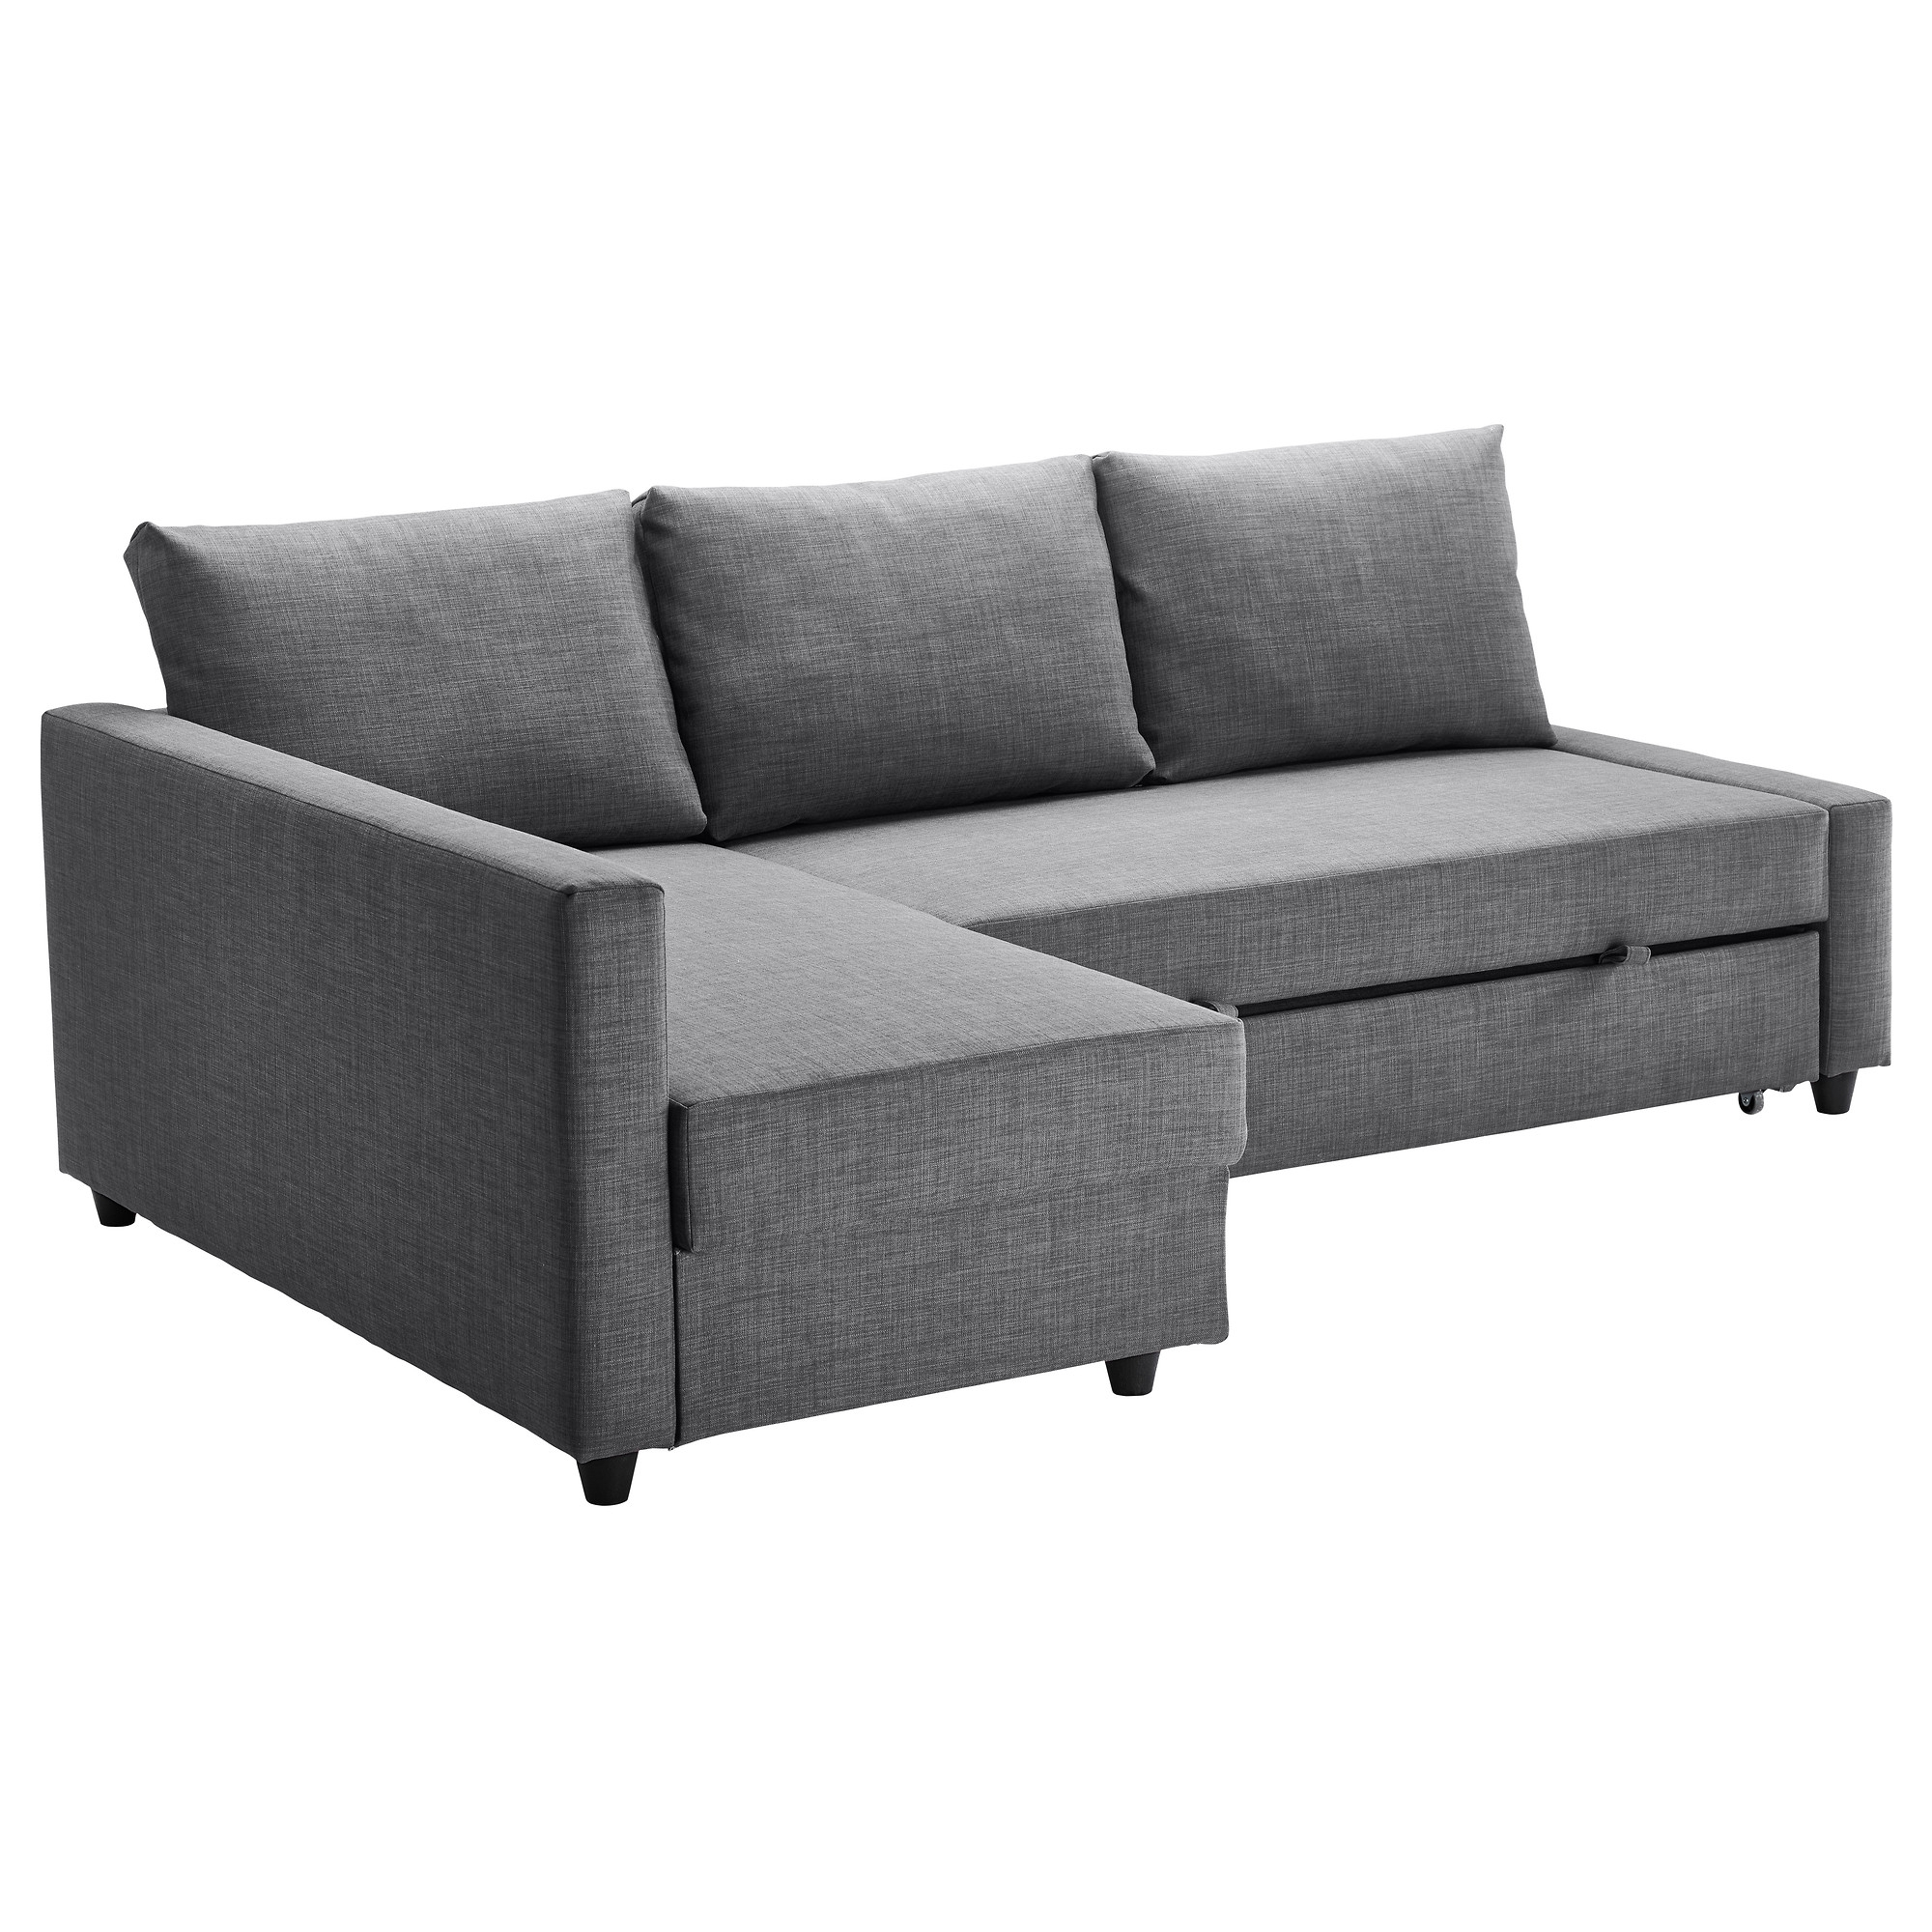 2018 Ikea Loveseat Sleeper Sofas Intended For Friheten Sleeper Sectional,3 Seat W/storage – Skiftebo Dark Gray (View 3 of 15)